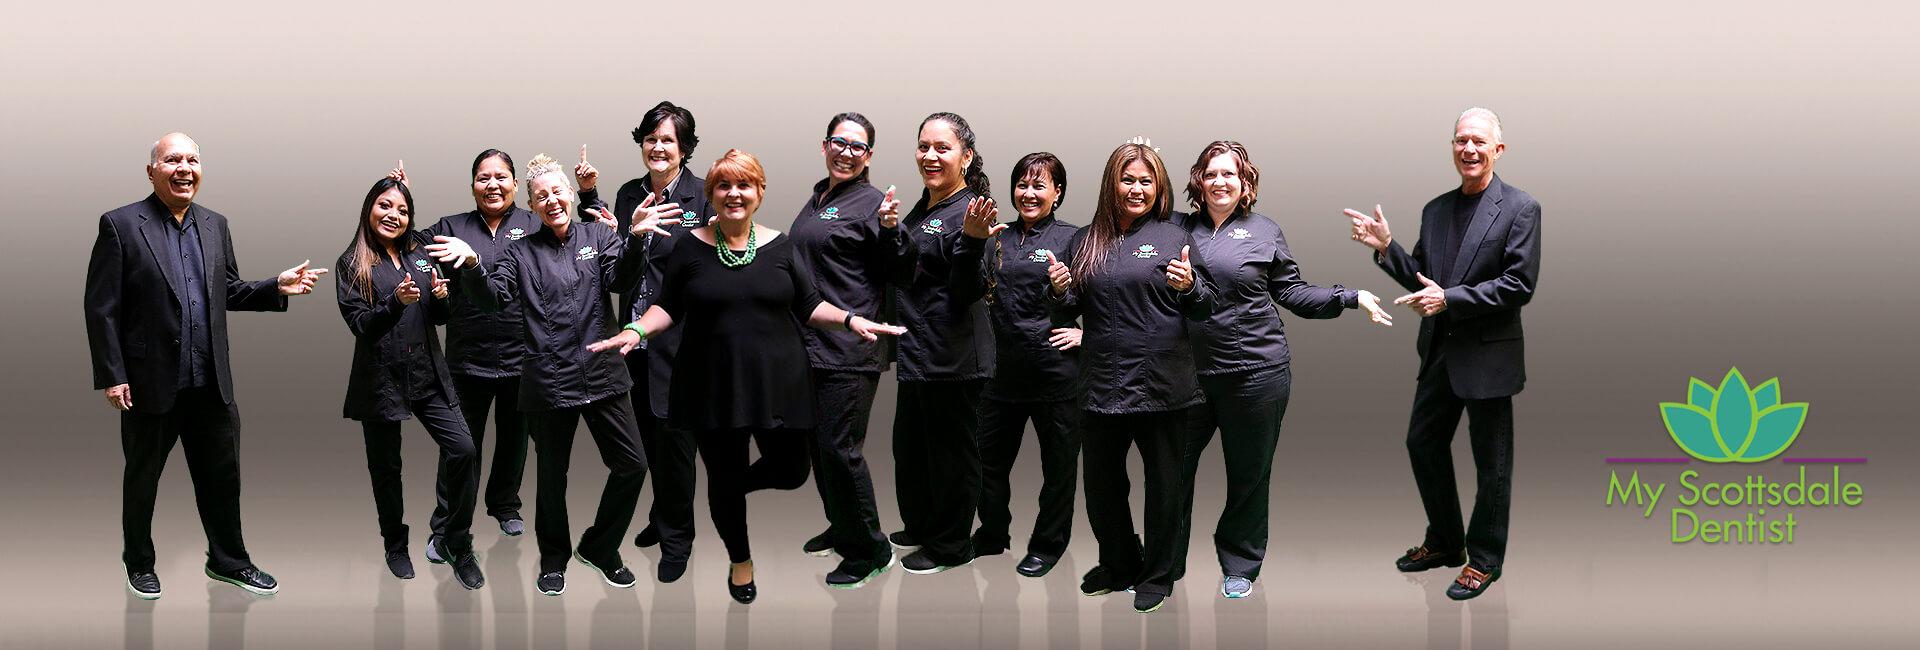 My Scottsdale Dentist Team